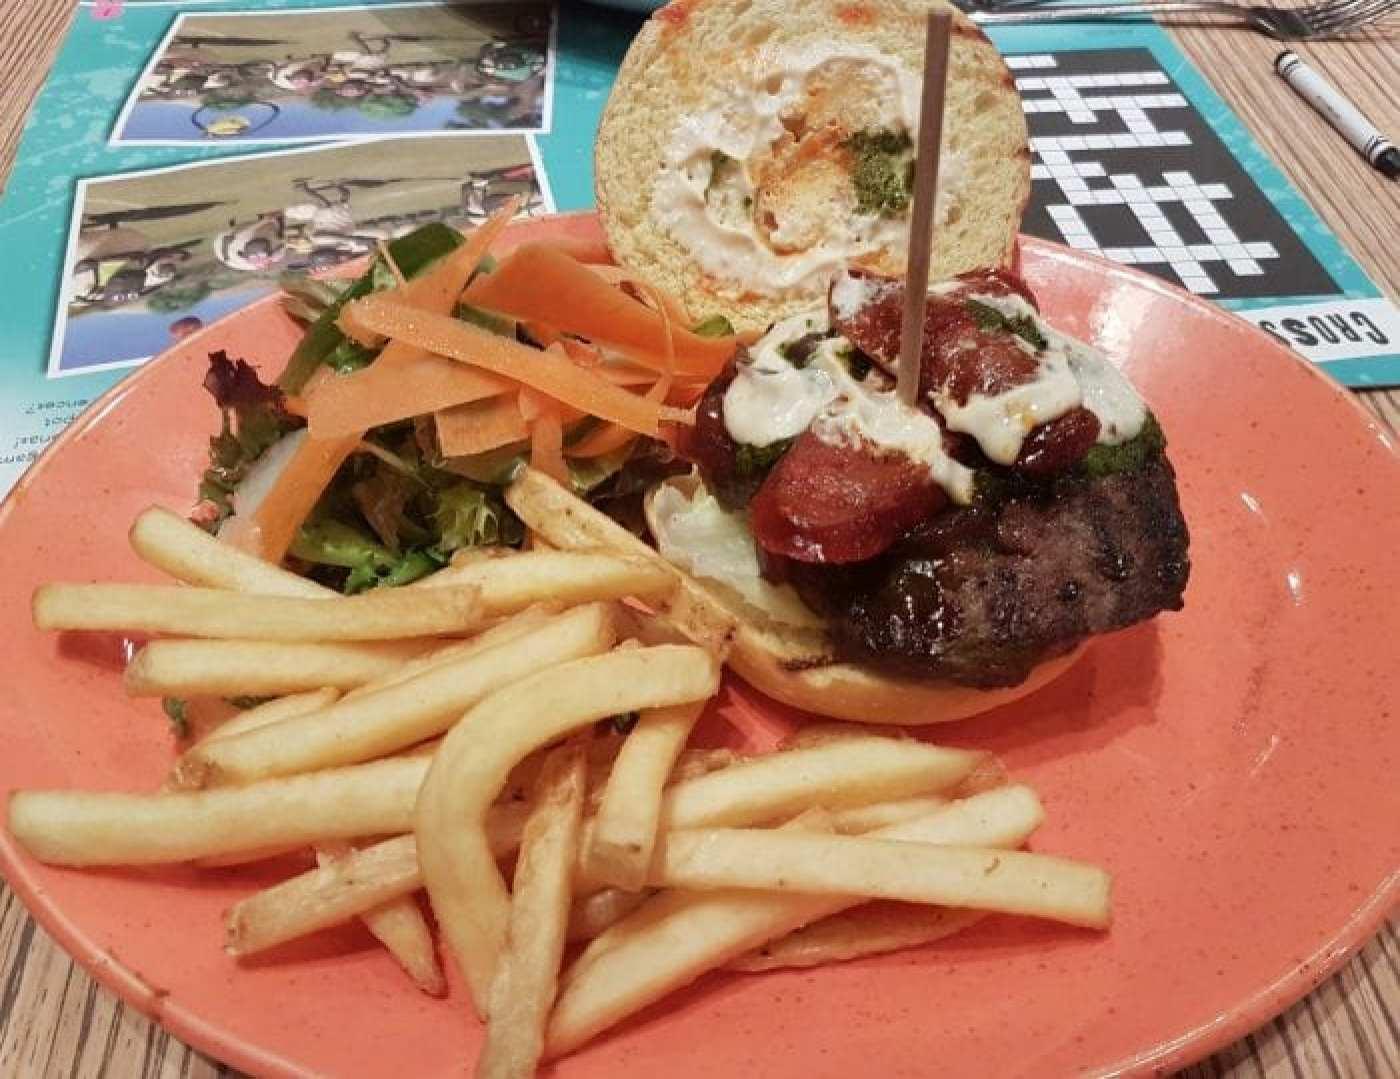 Las Iguanas burger